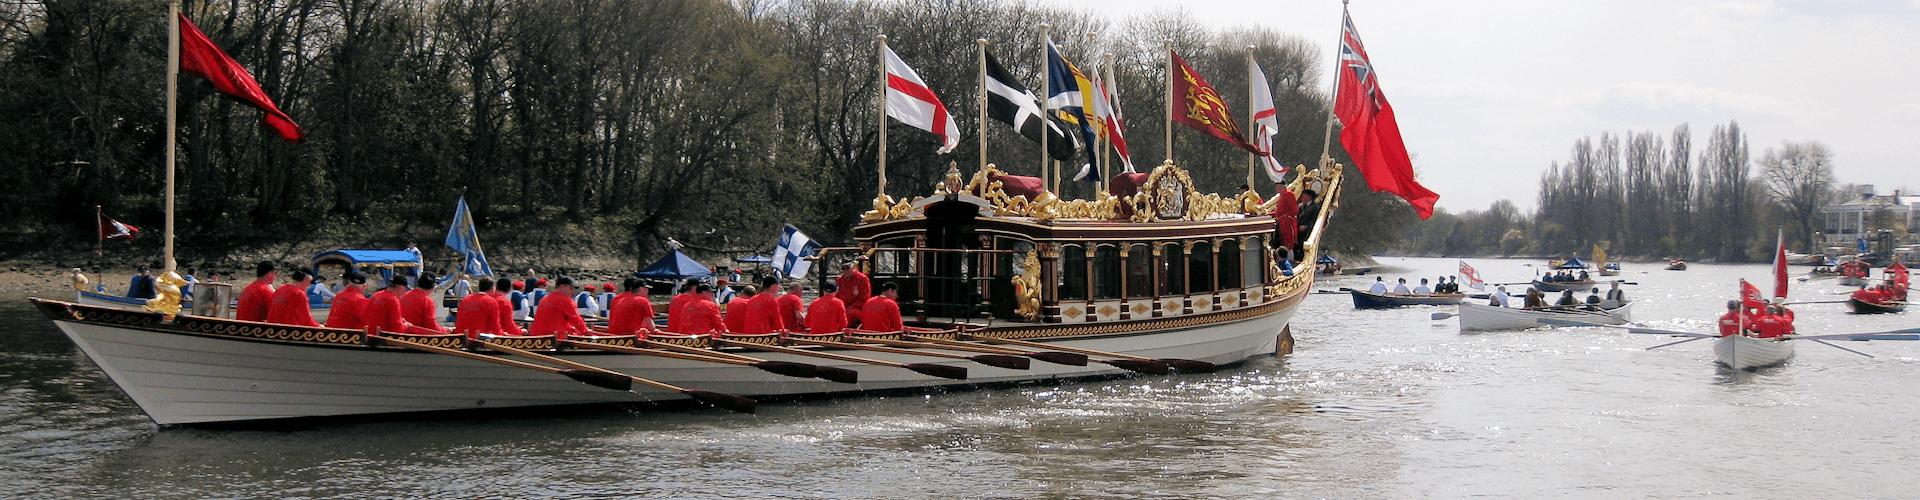 Tudor Pull 2013